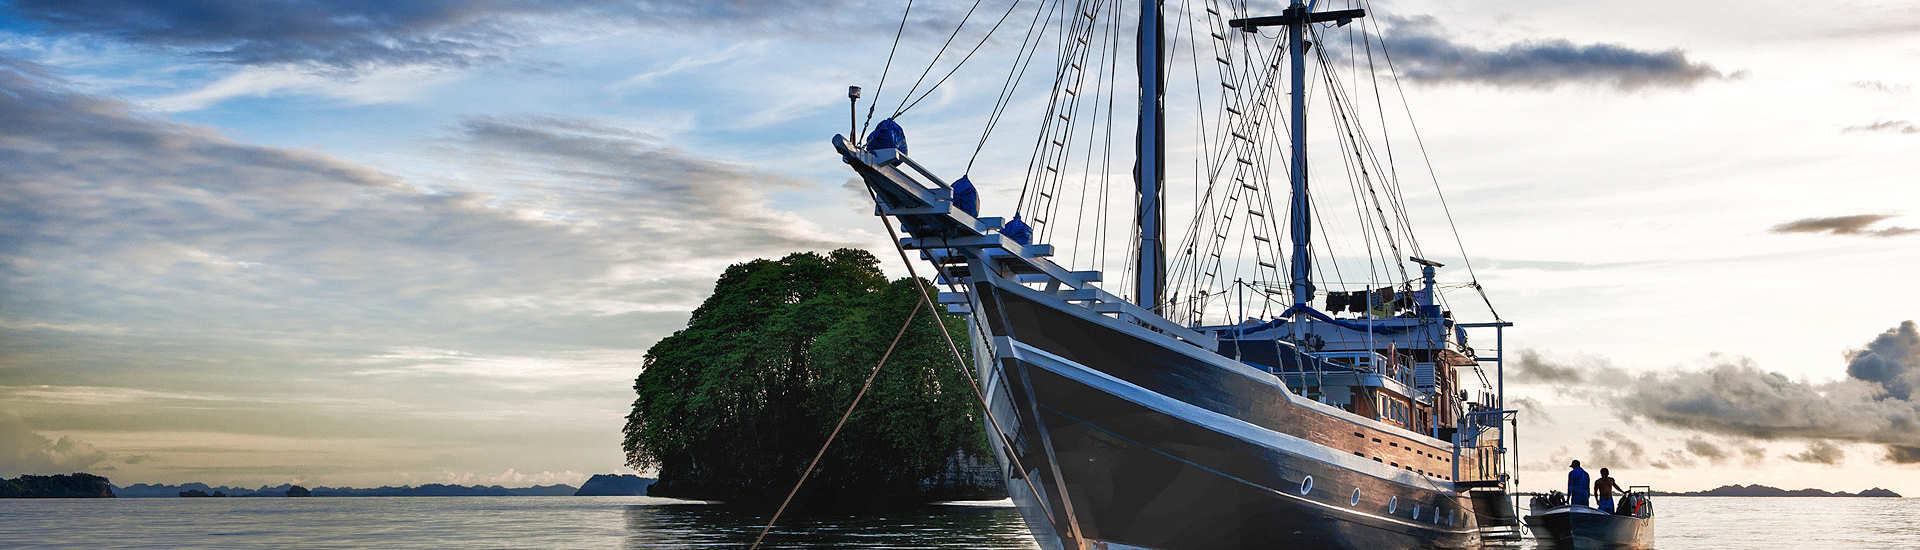 MSY Seahorse – Tauchsafaris Raja Ampat